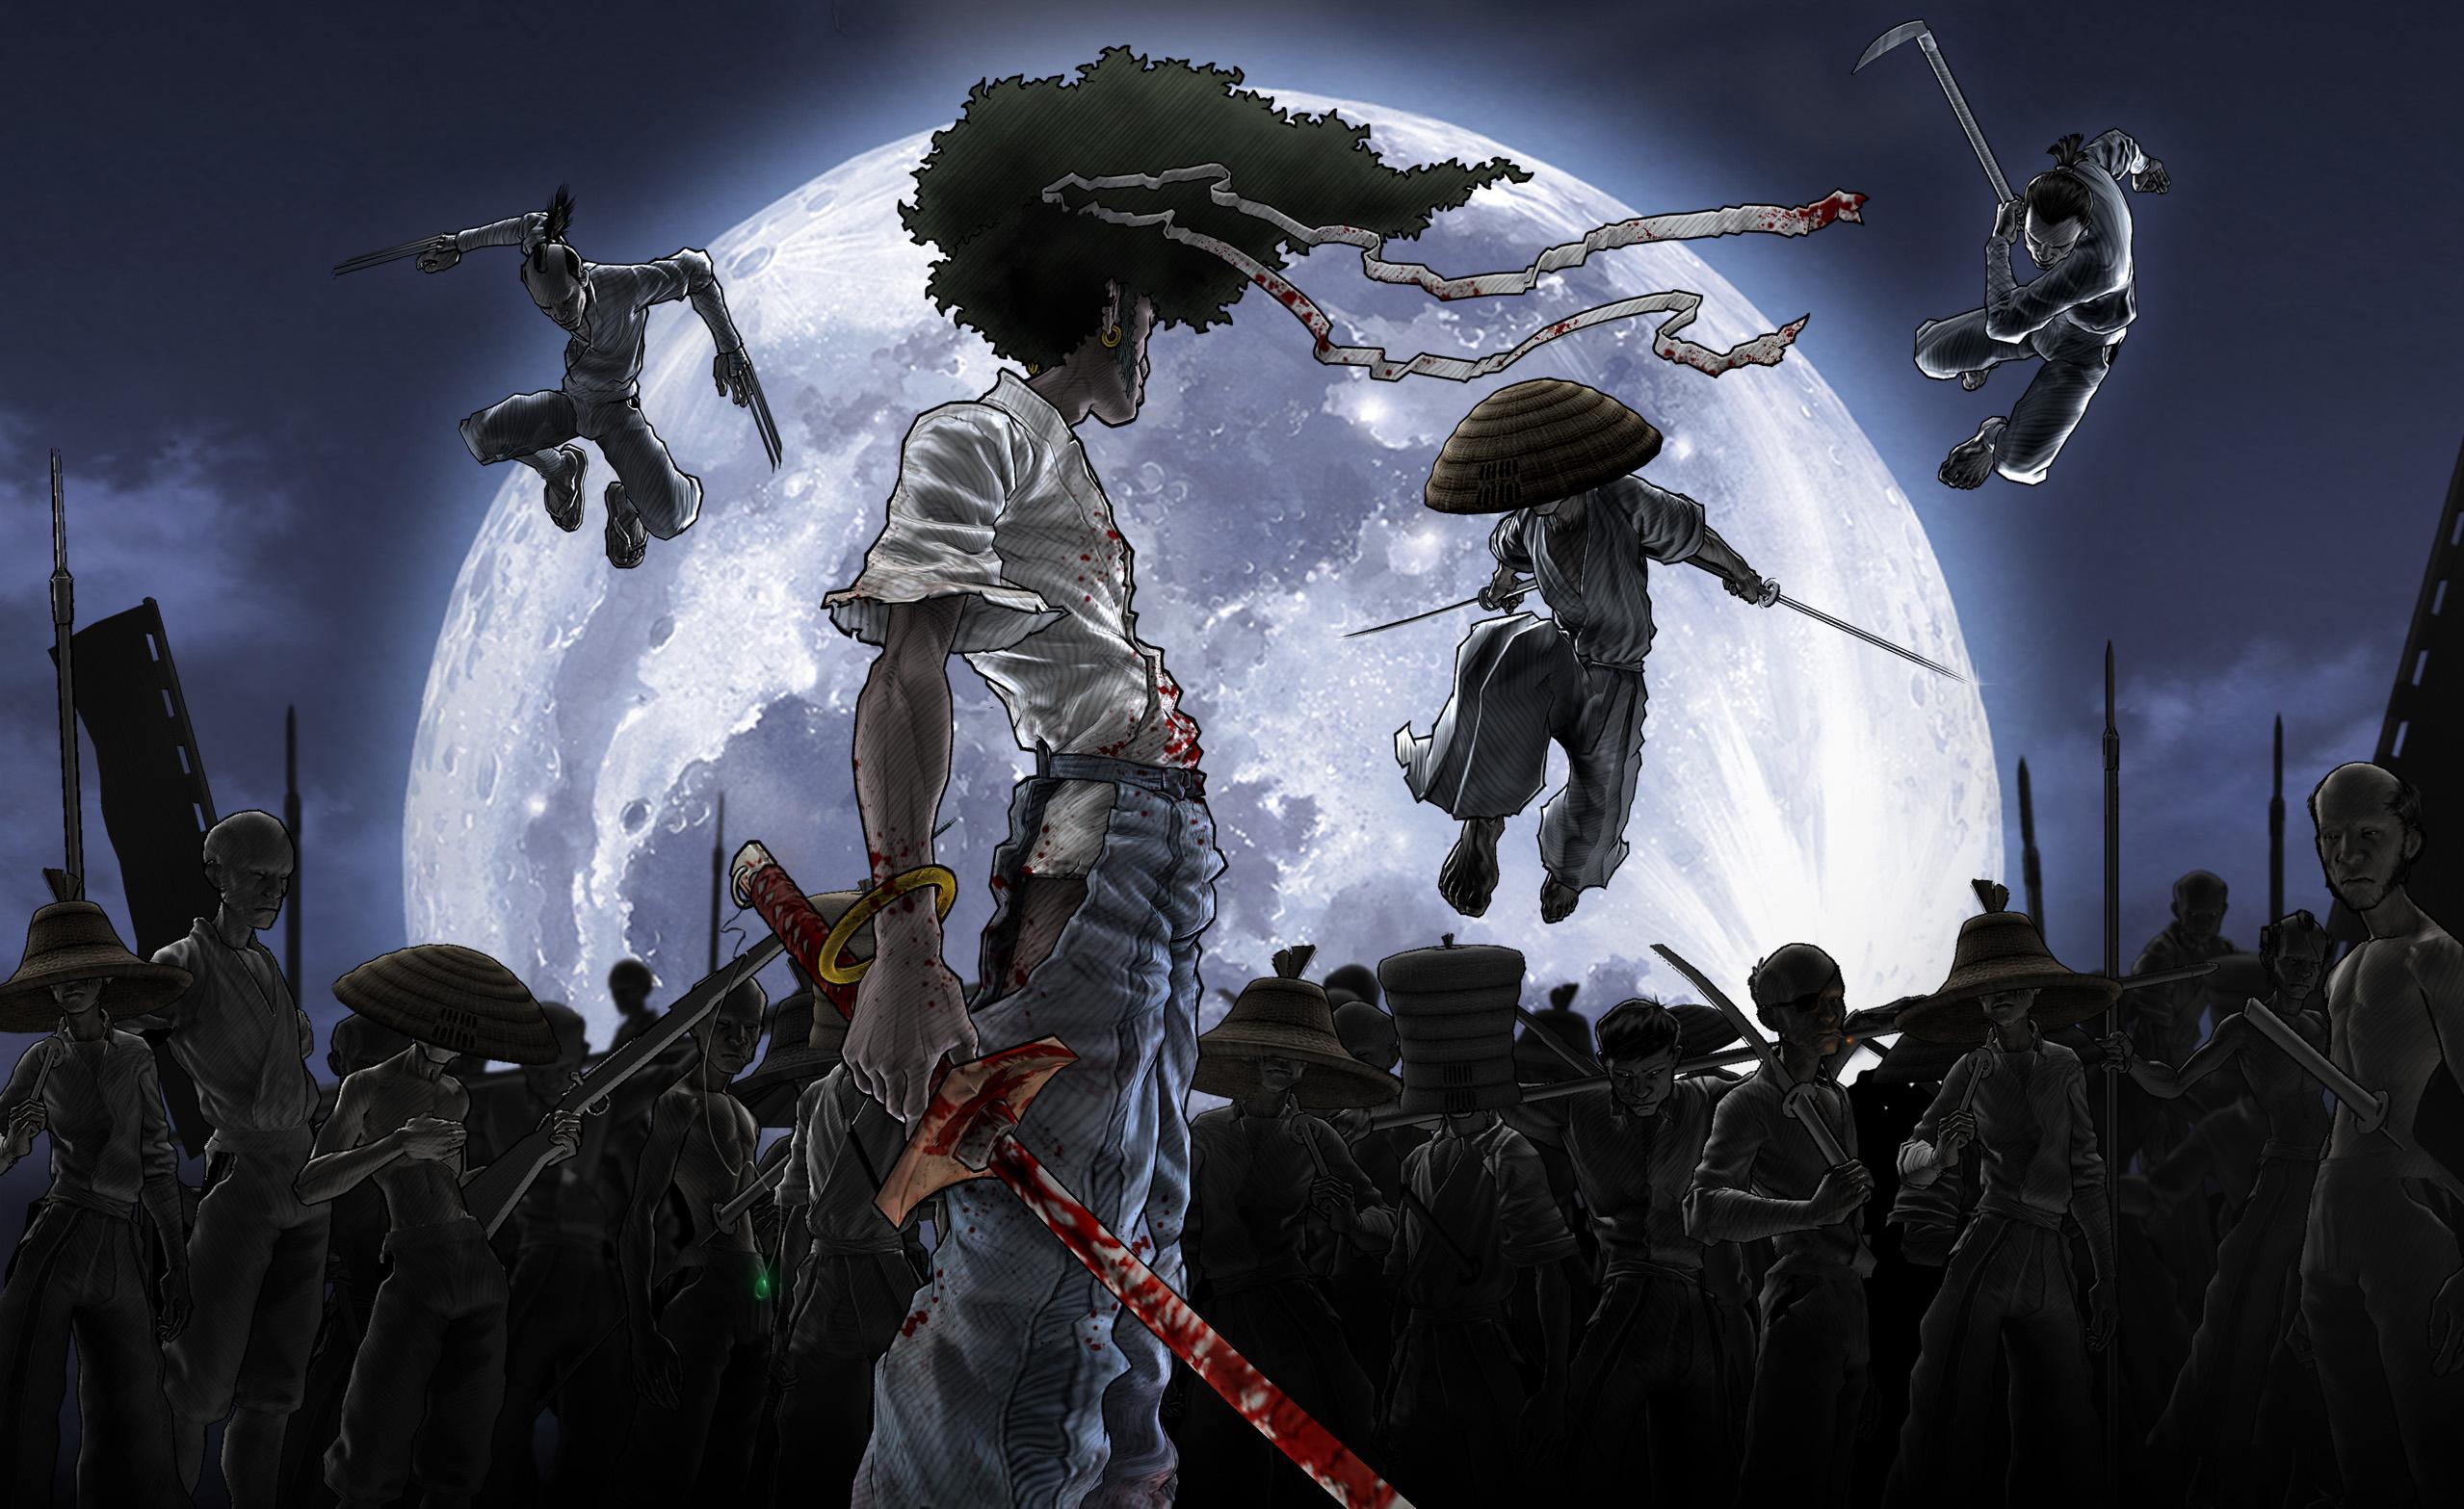 Afro Samurai HD Wallpaper | Background Image | 2558x1567 ...